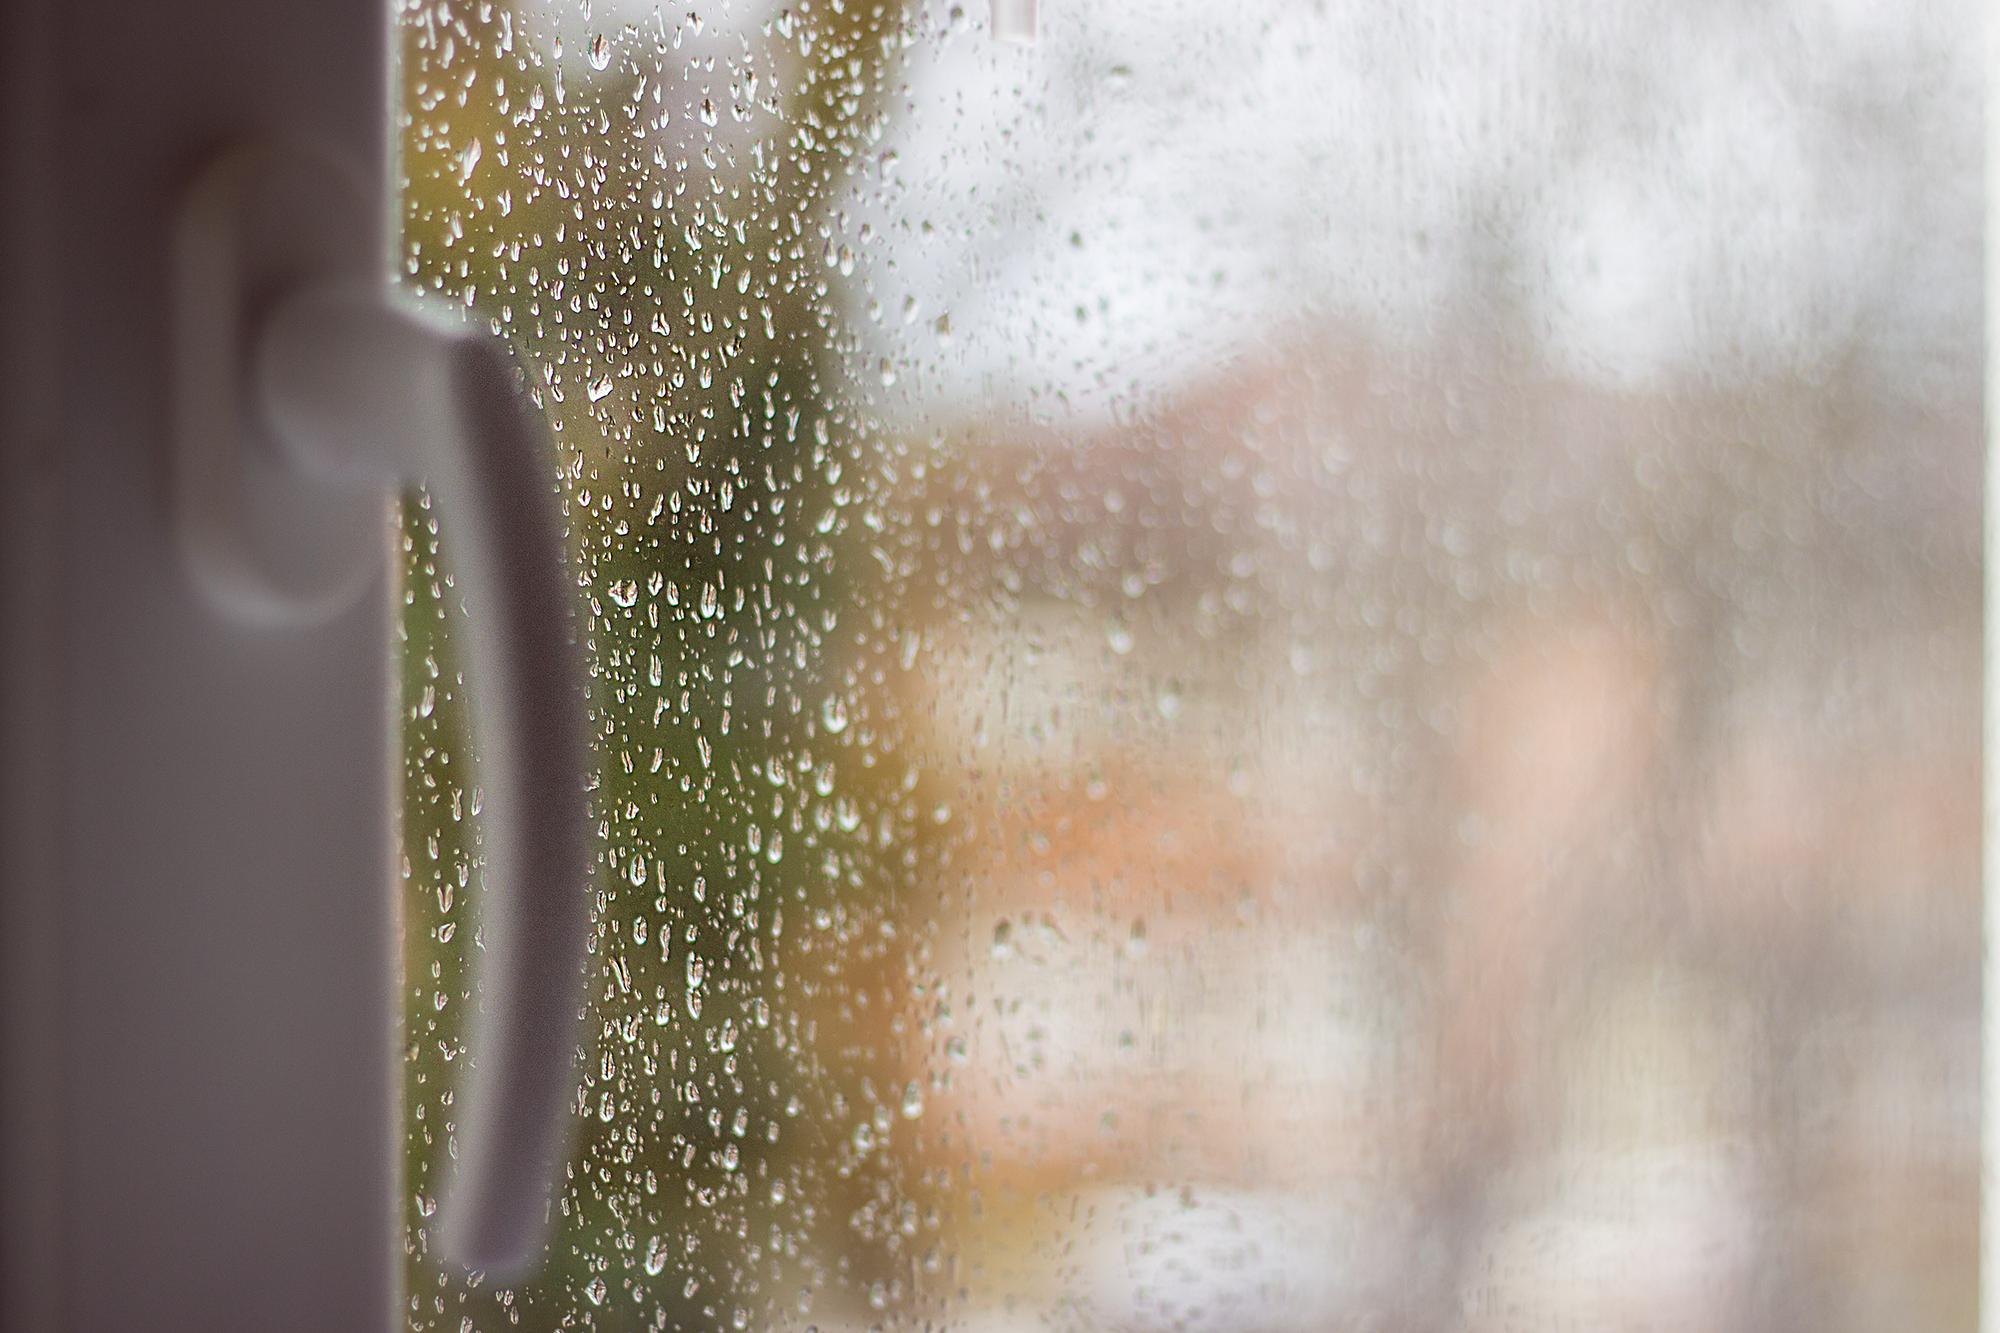 Fotografie bei Regen - Regentropfen an Fenster